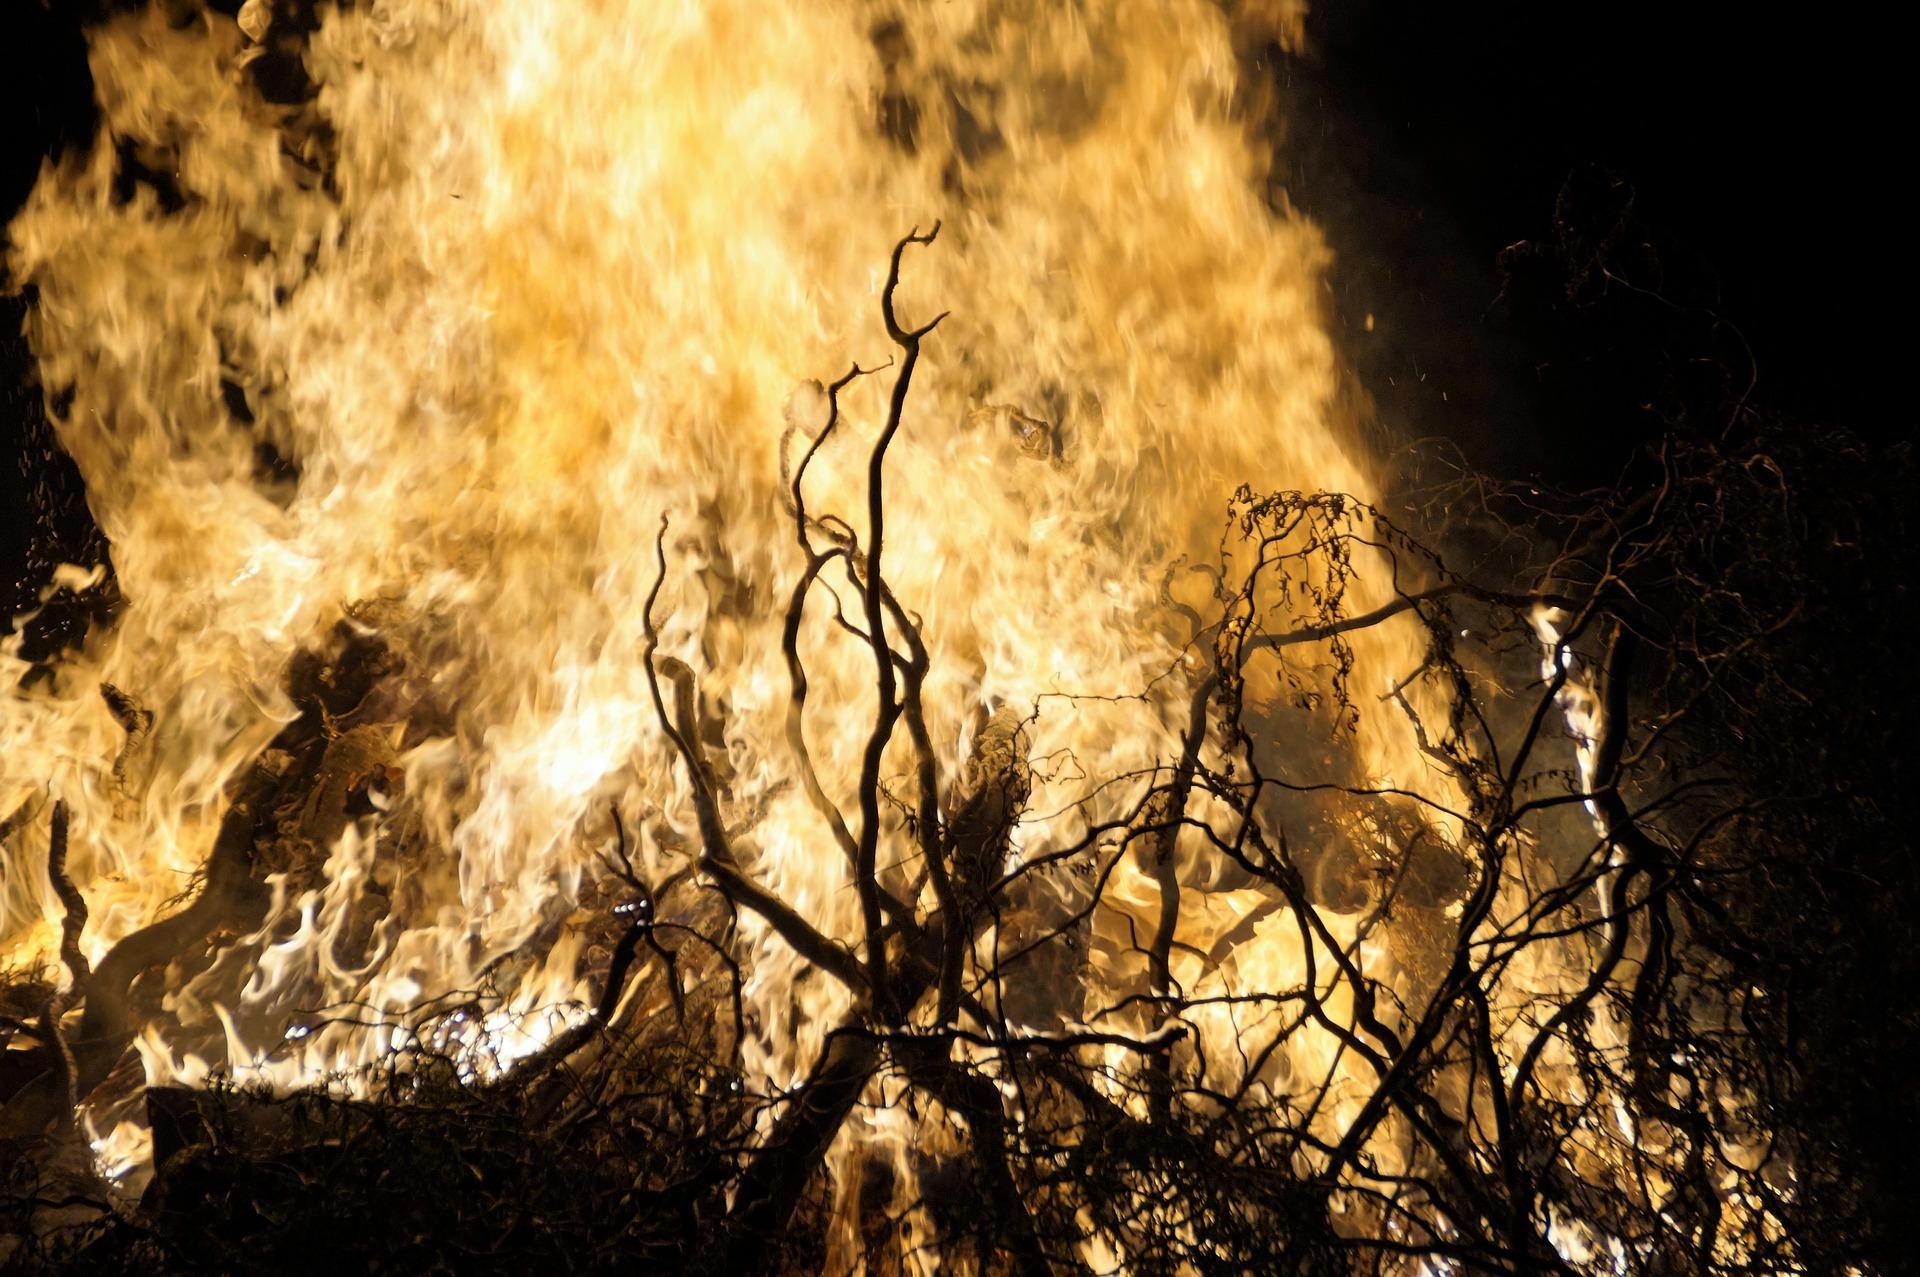 Walpurgisnacht - Hexensabbat